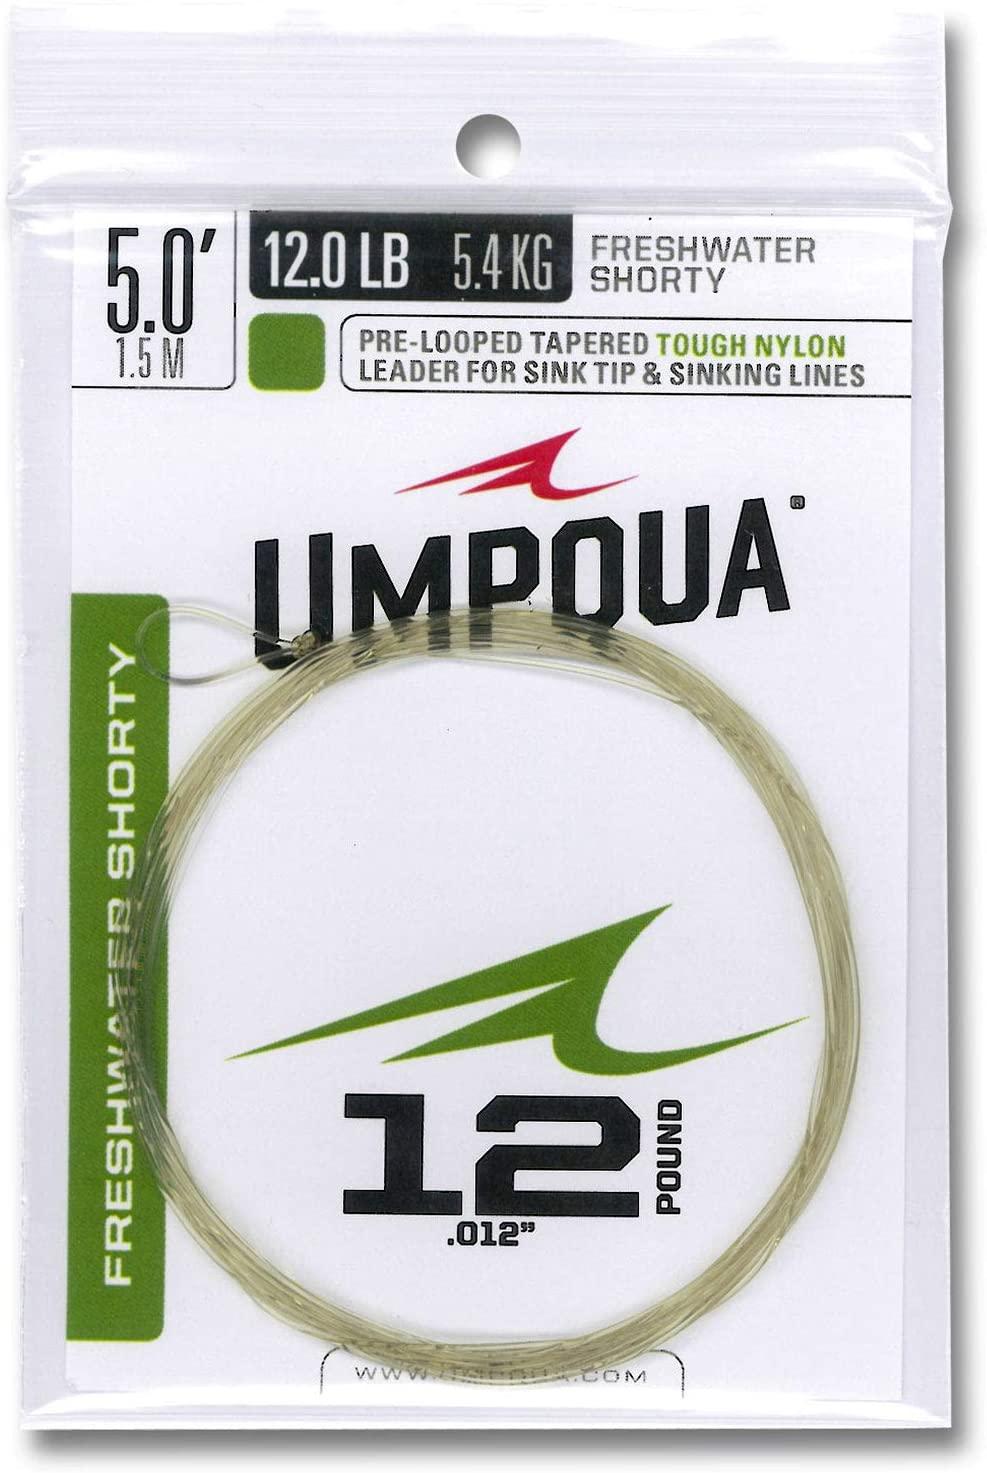 Umpqua Freshwater Shorty 5'-12Lb Leader